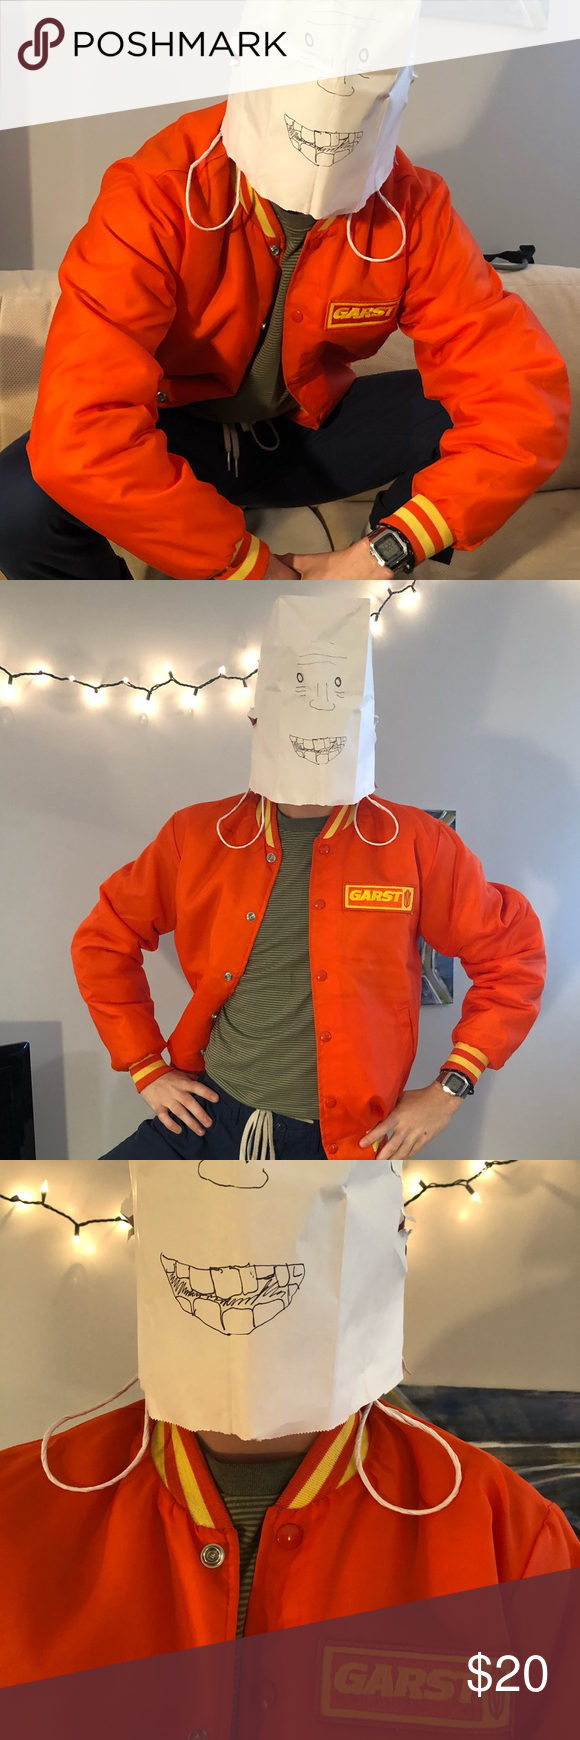 Vintage bomber / varsity jacket A bomber jacket from an old corn company. Make everyone crazy with your blazin' maize blaze-r. Swingster Jackets & Coats Bomber & Varsity #varsityjacketoutfit